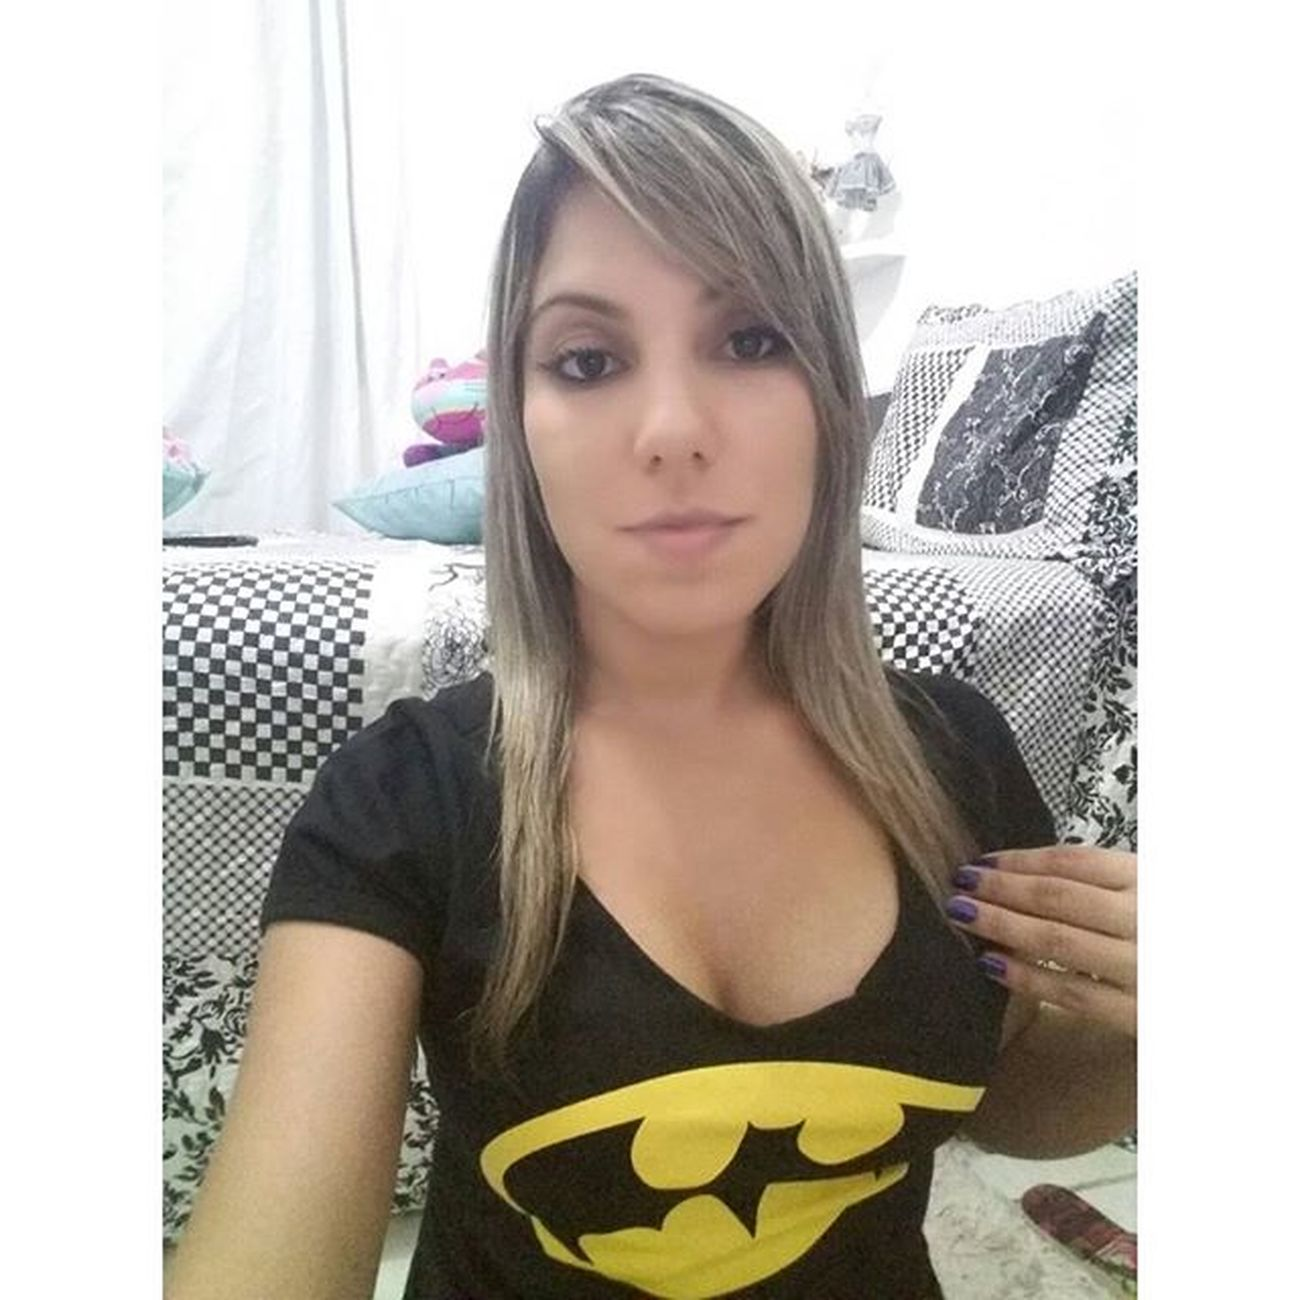 Apenax Boanoite Batgirl Nerdgirl Rockgirl Superhero Geekgirl Batwoman ILoveSuperHeroShirts